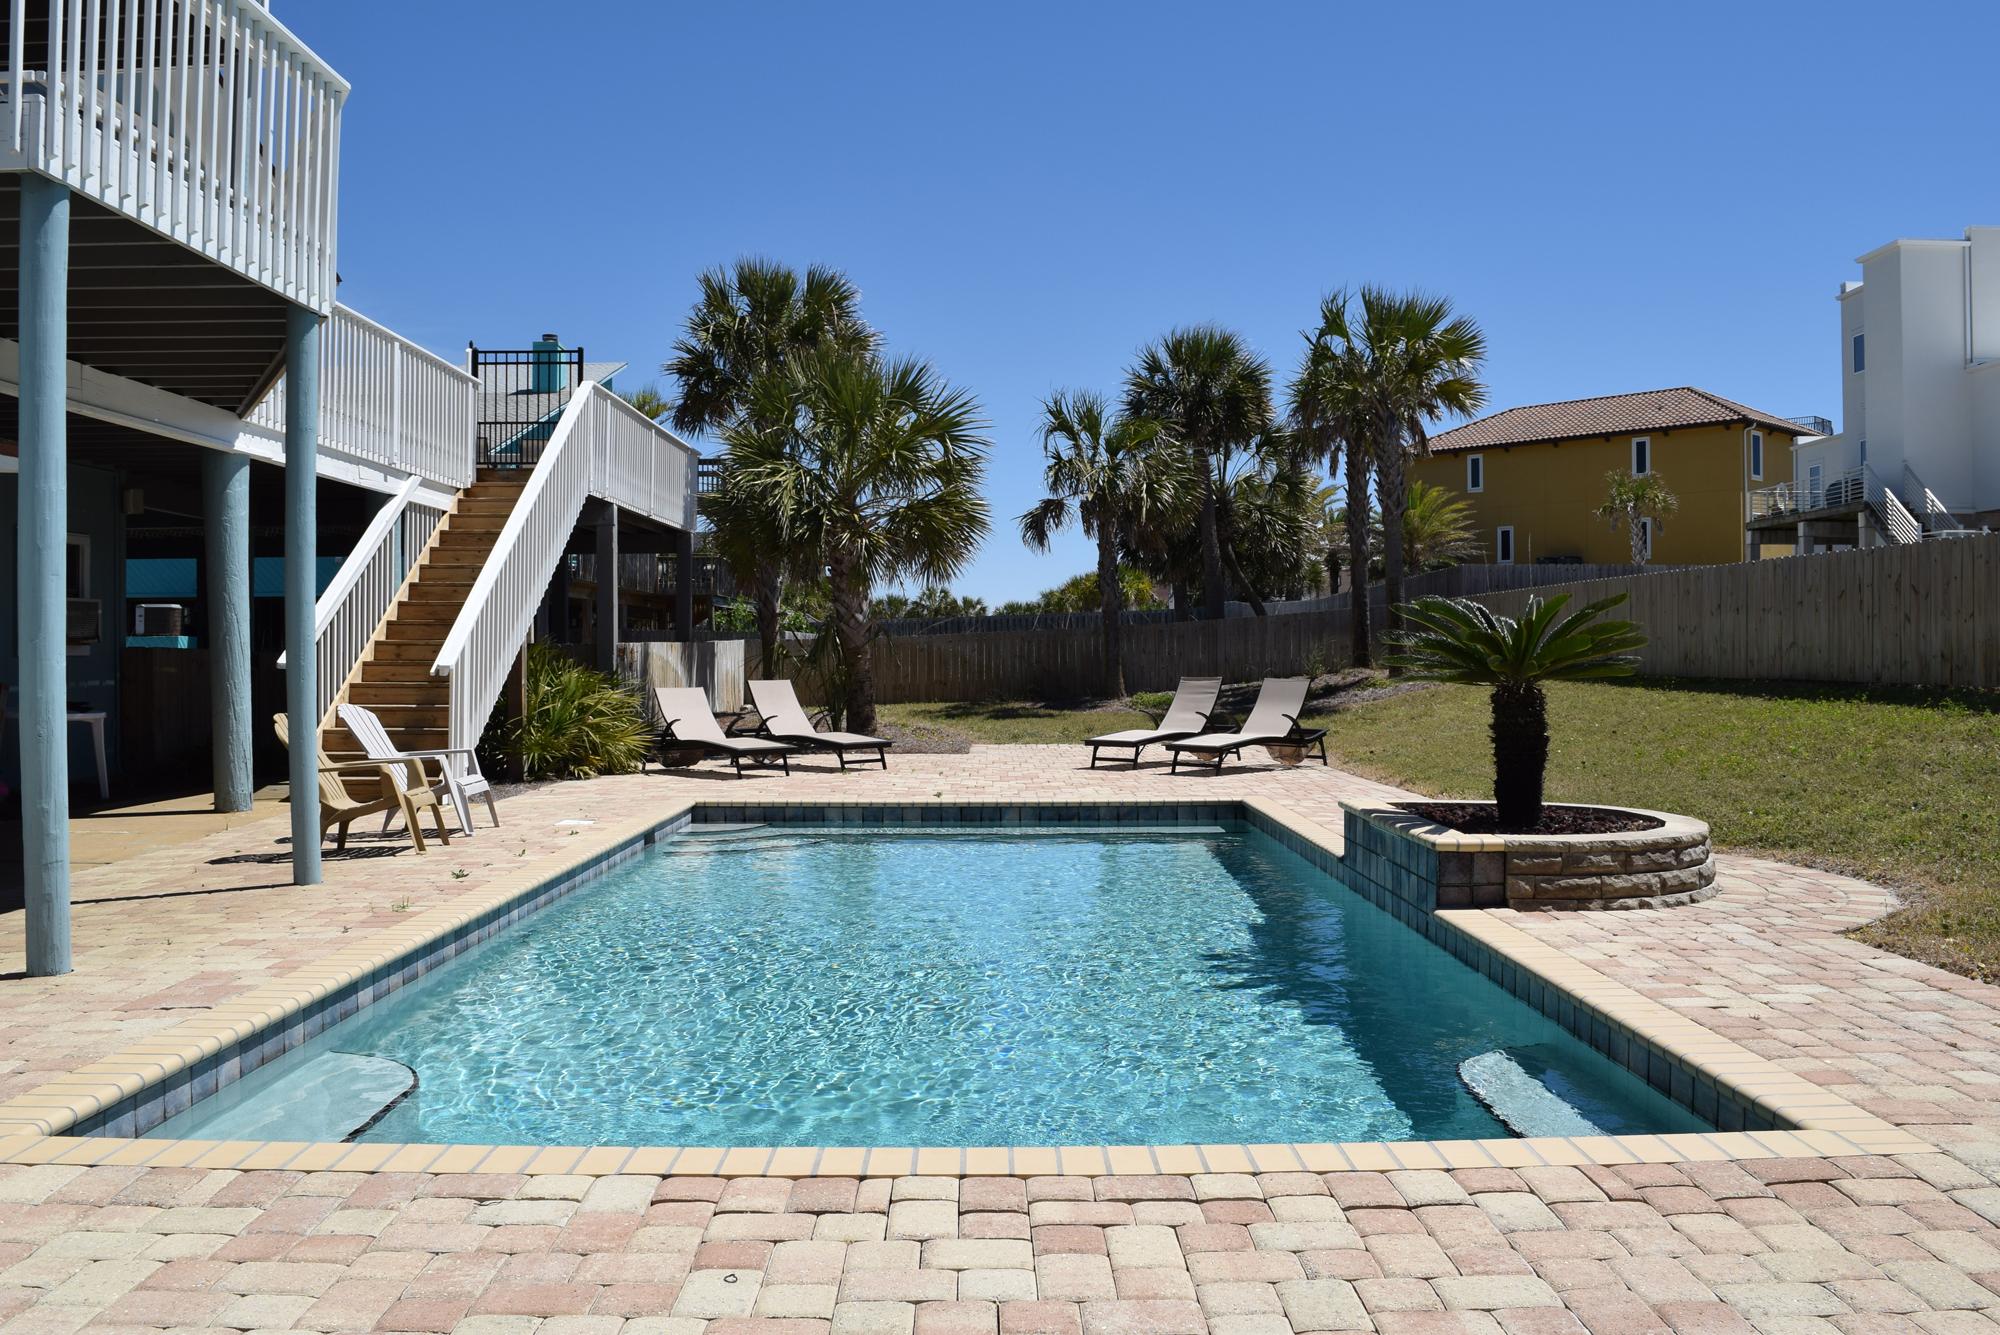 Maldonado 1010 House/Cottage rental in Pensacola Beach House Rentals in Pensacola Beach Florida - #3